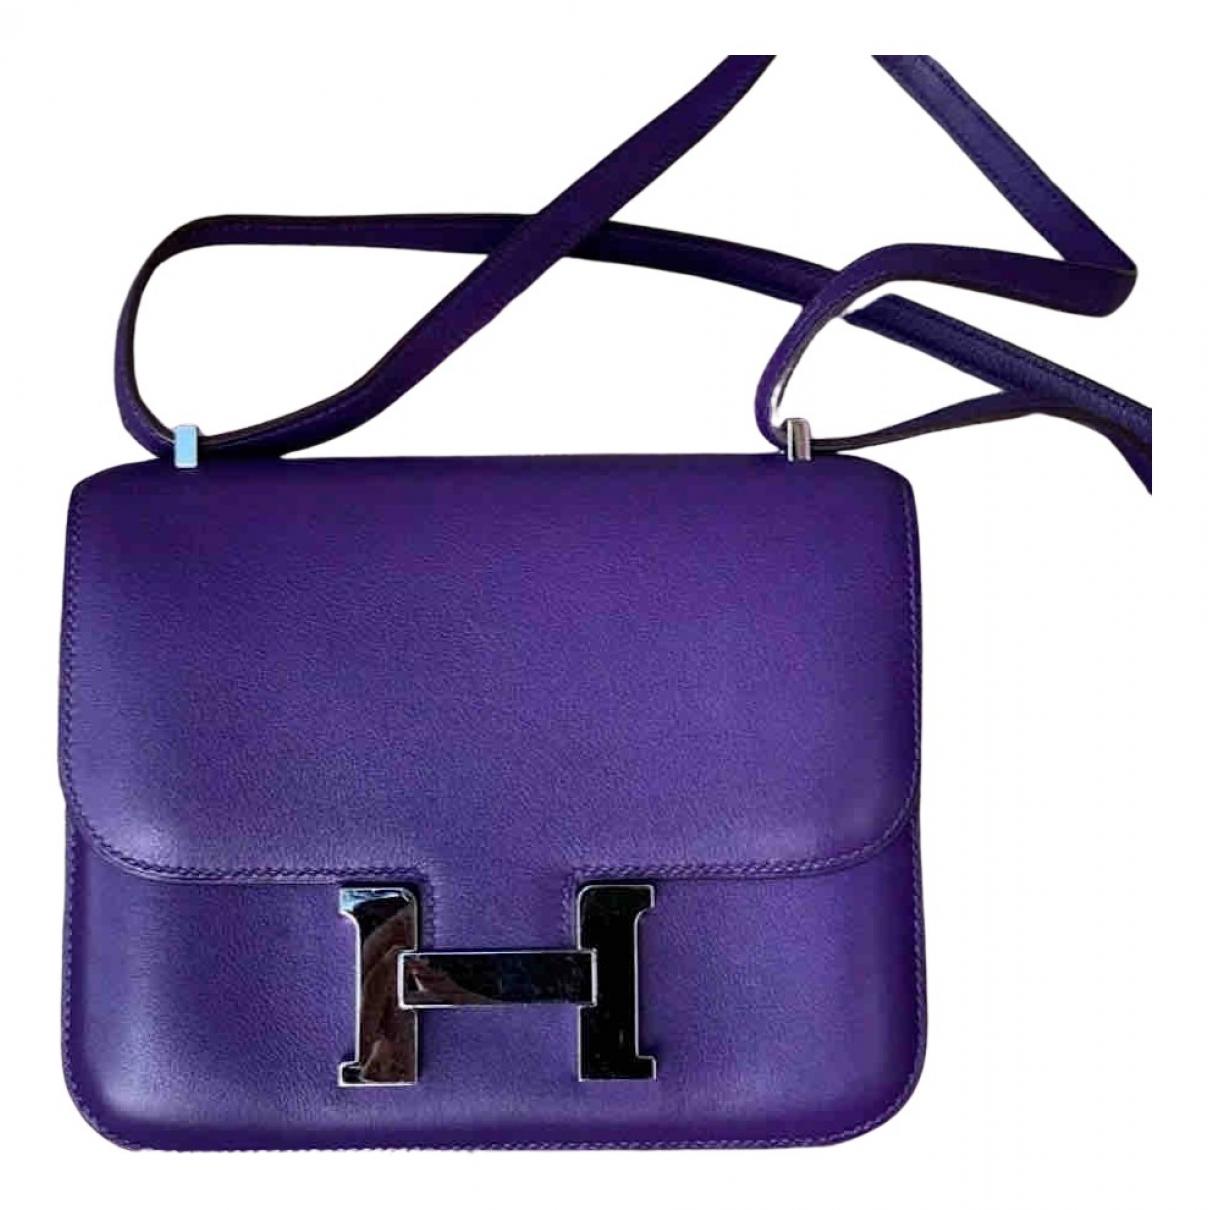 Hermes Constance Handtasche in  Lila Leder